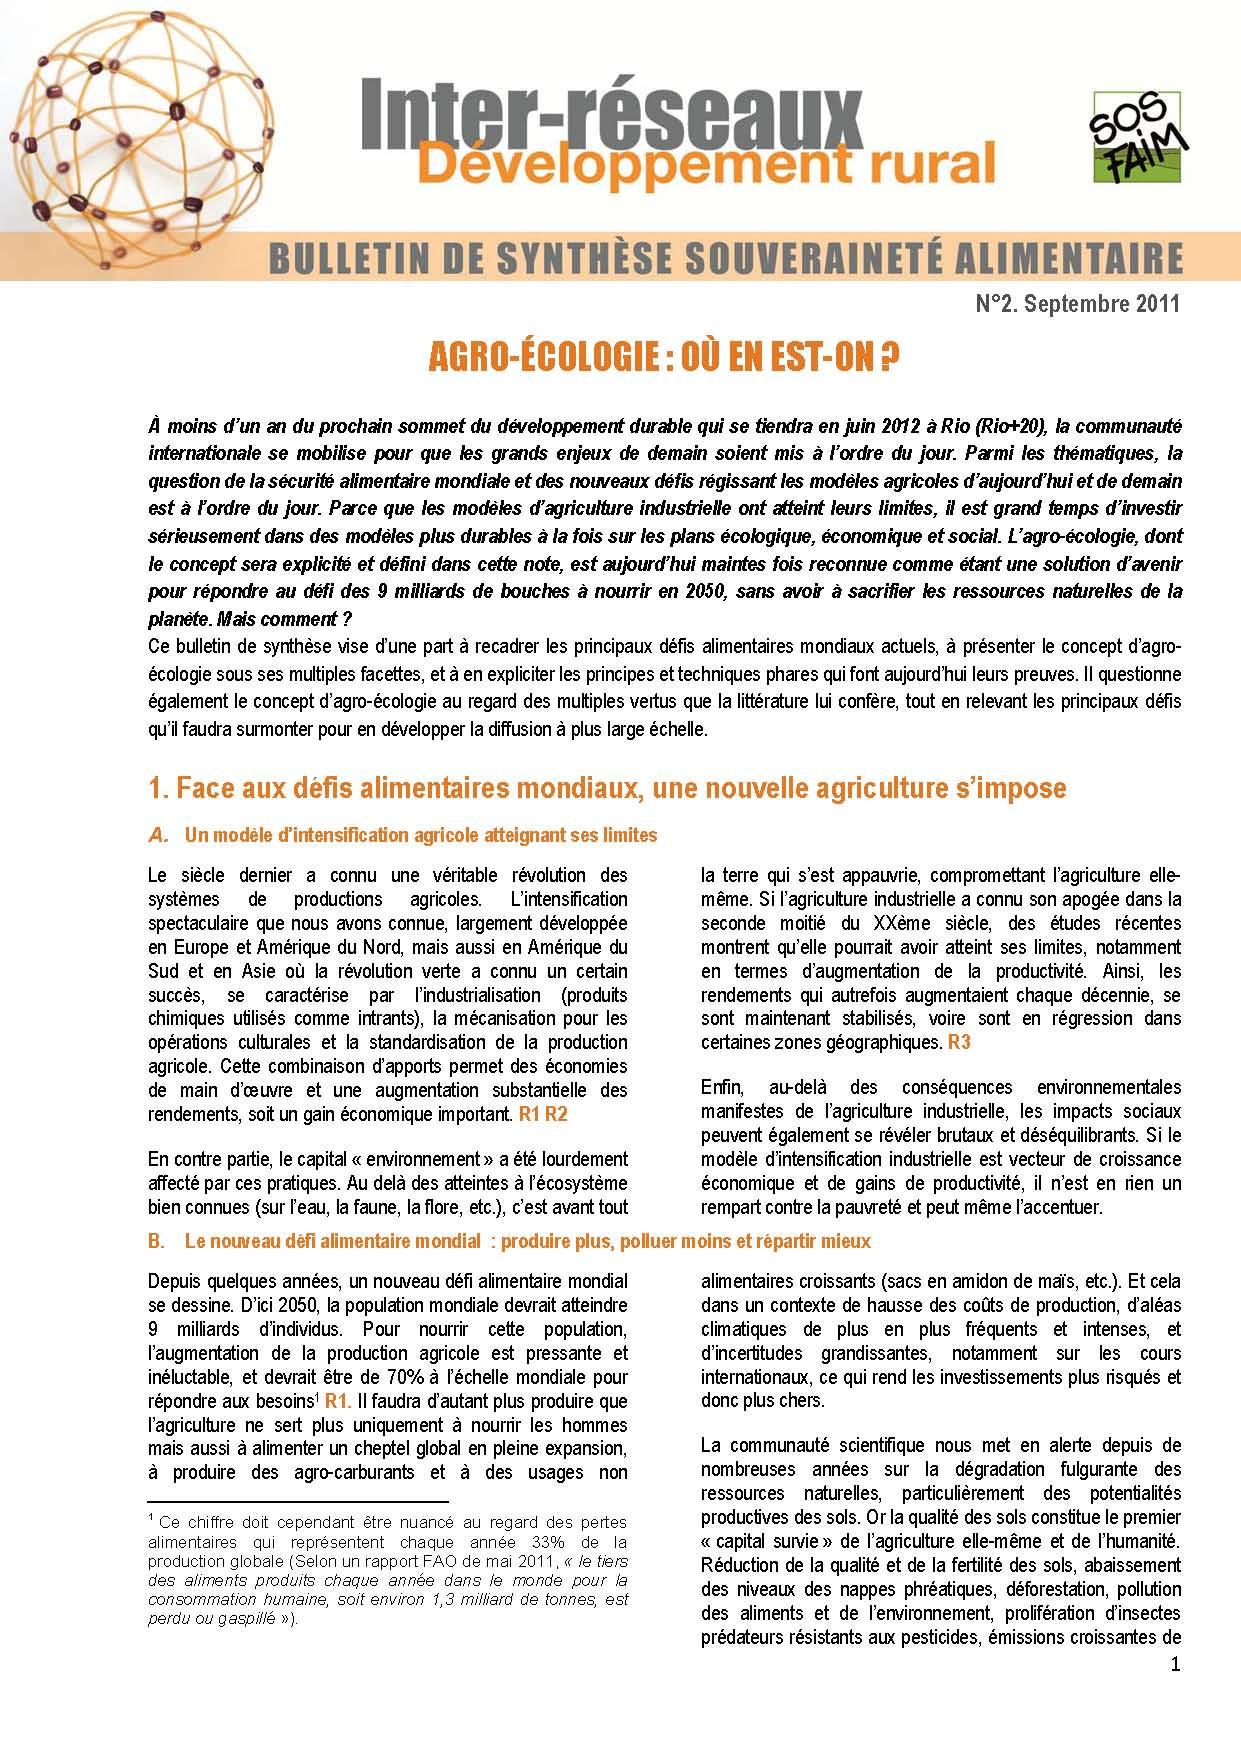 Bulletin de synthèse n°2 - Agro-écologie : où en est-on ?